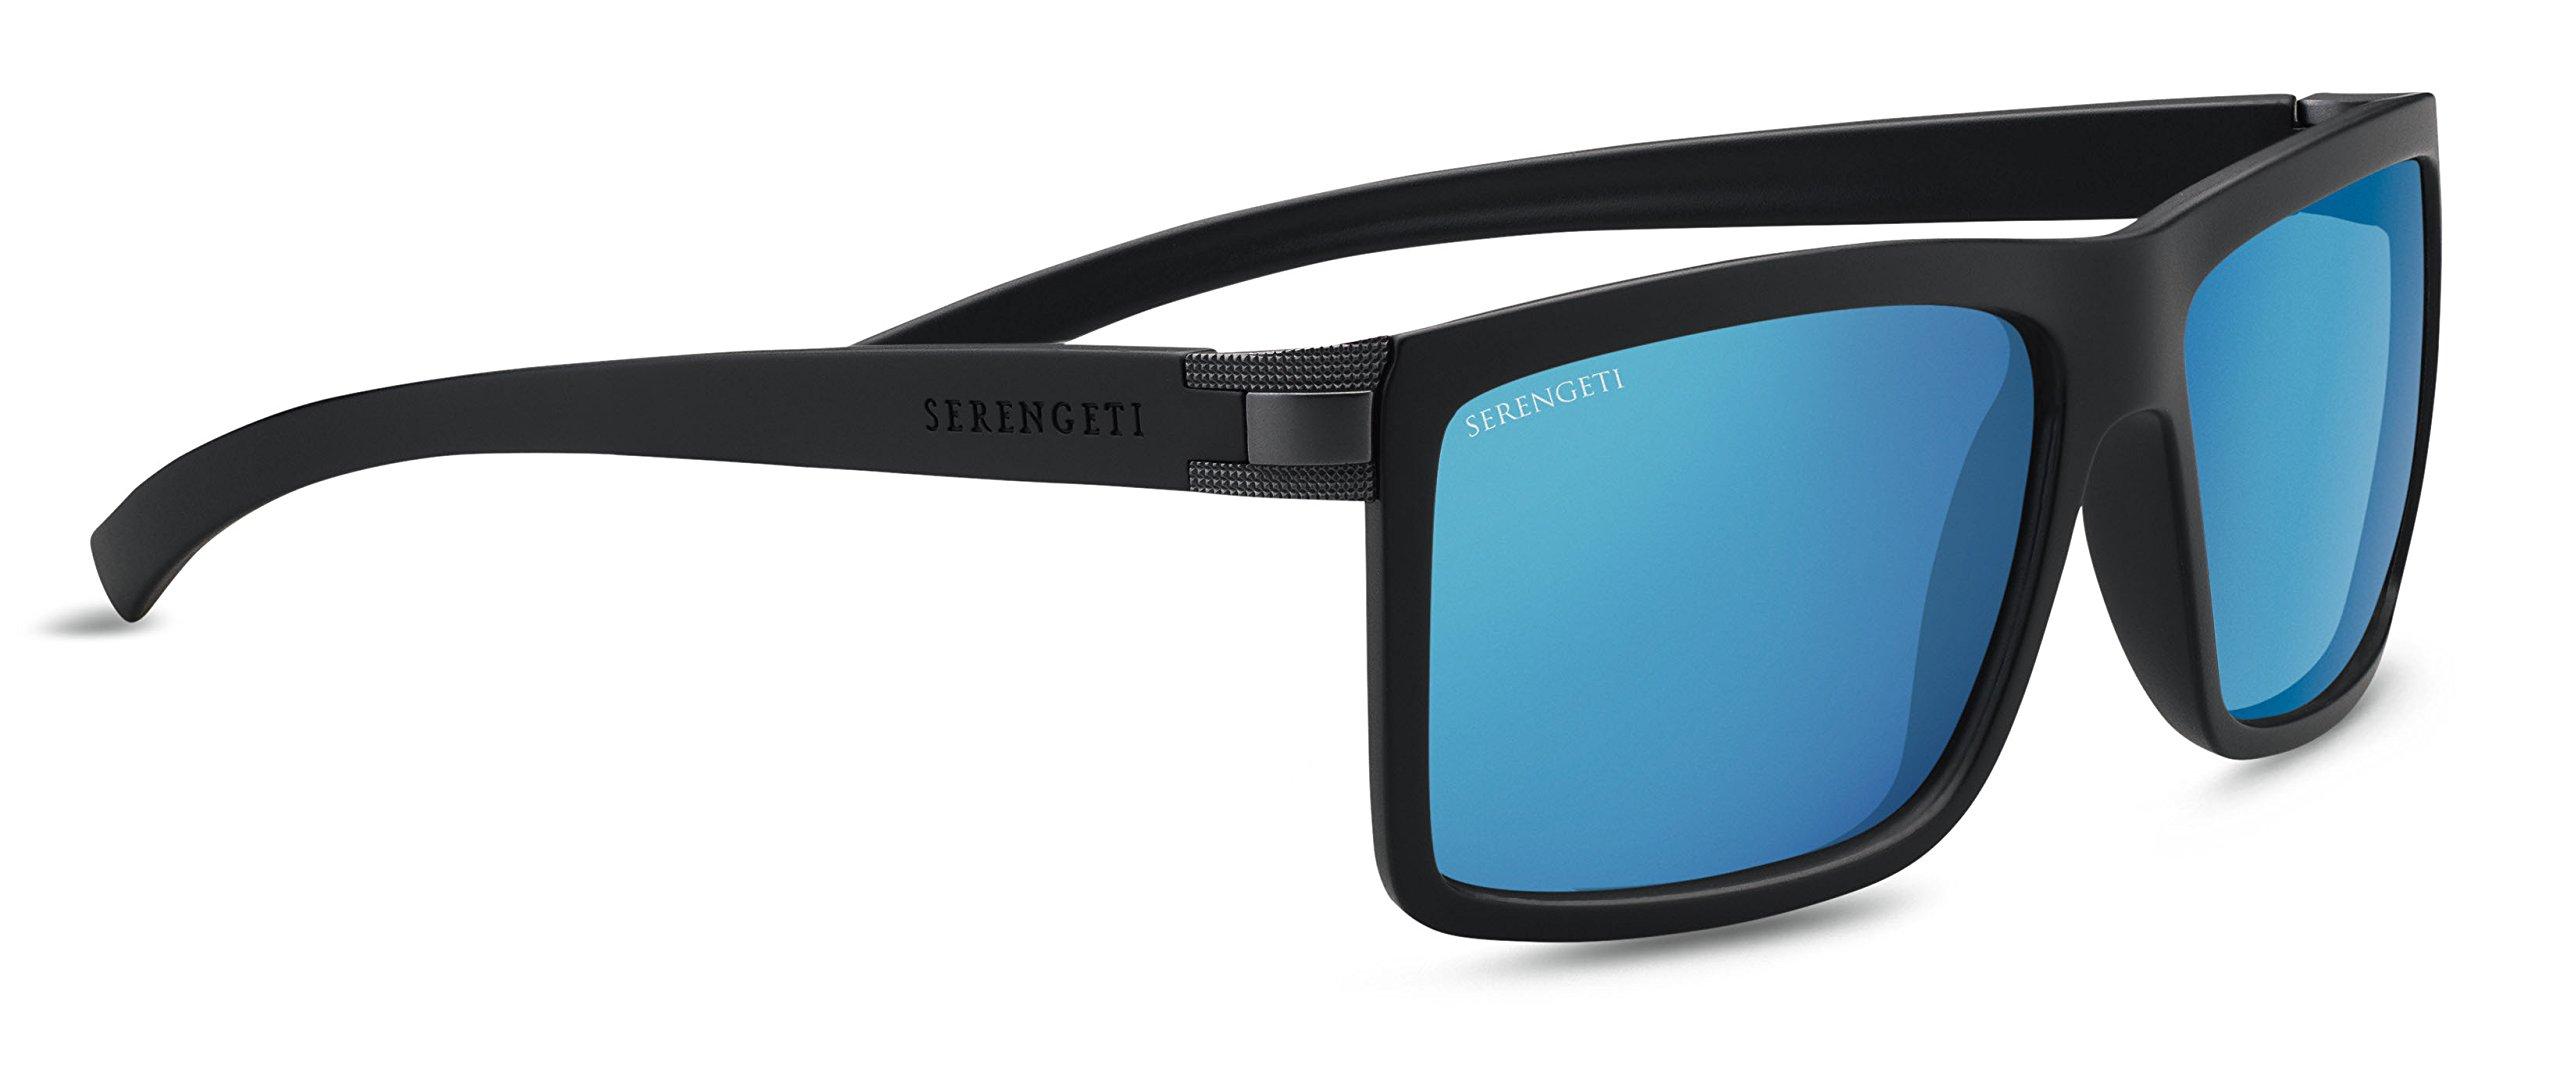 Serengeti Brera Large Sunglasses Sanded Black/Satin Dark Gunmetal, Blue